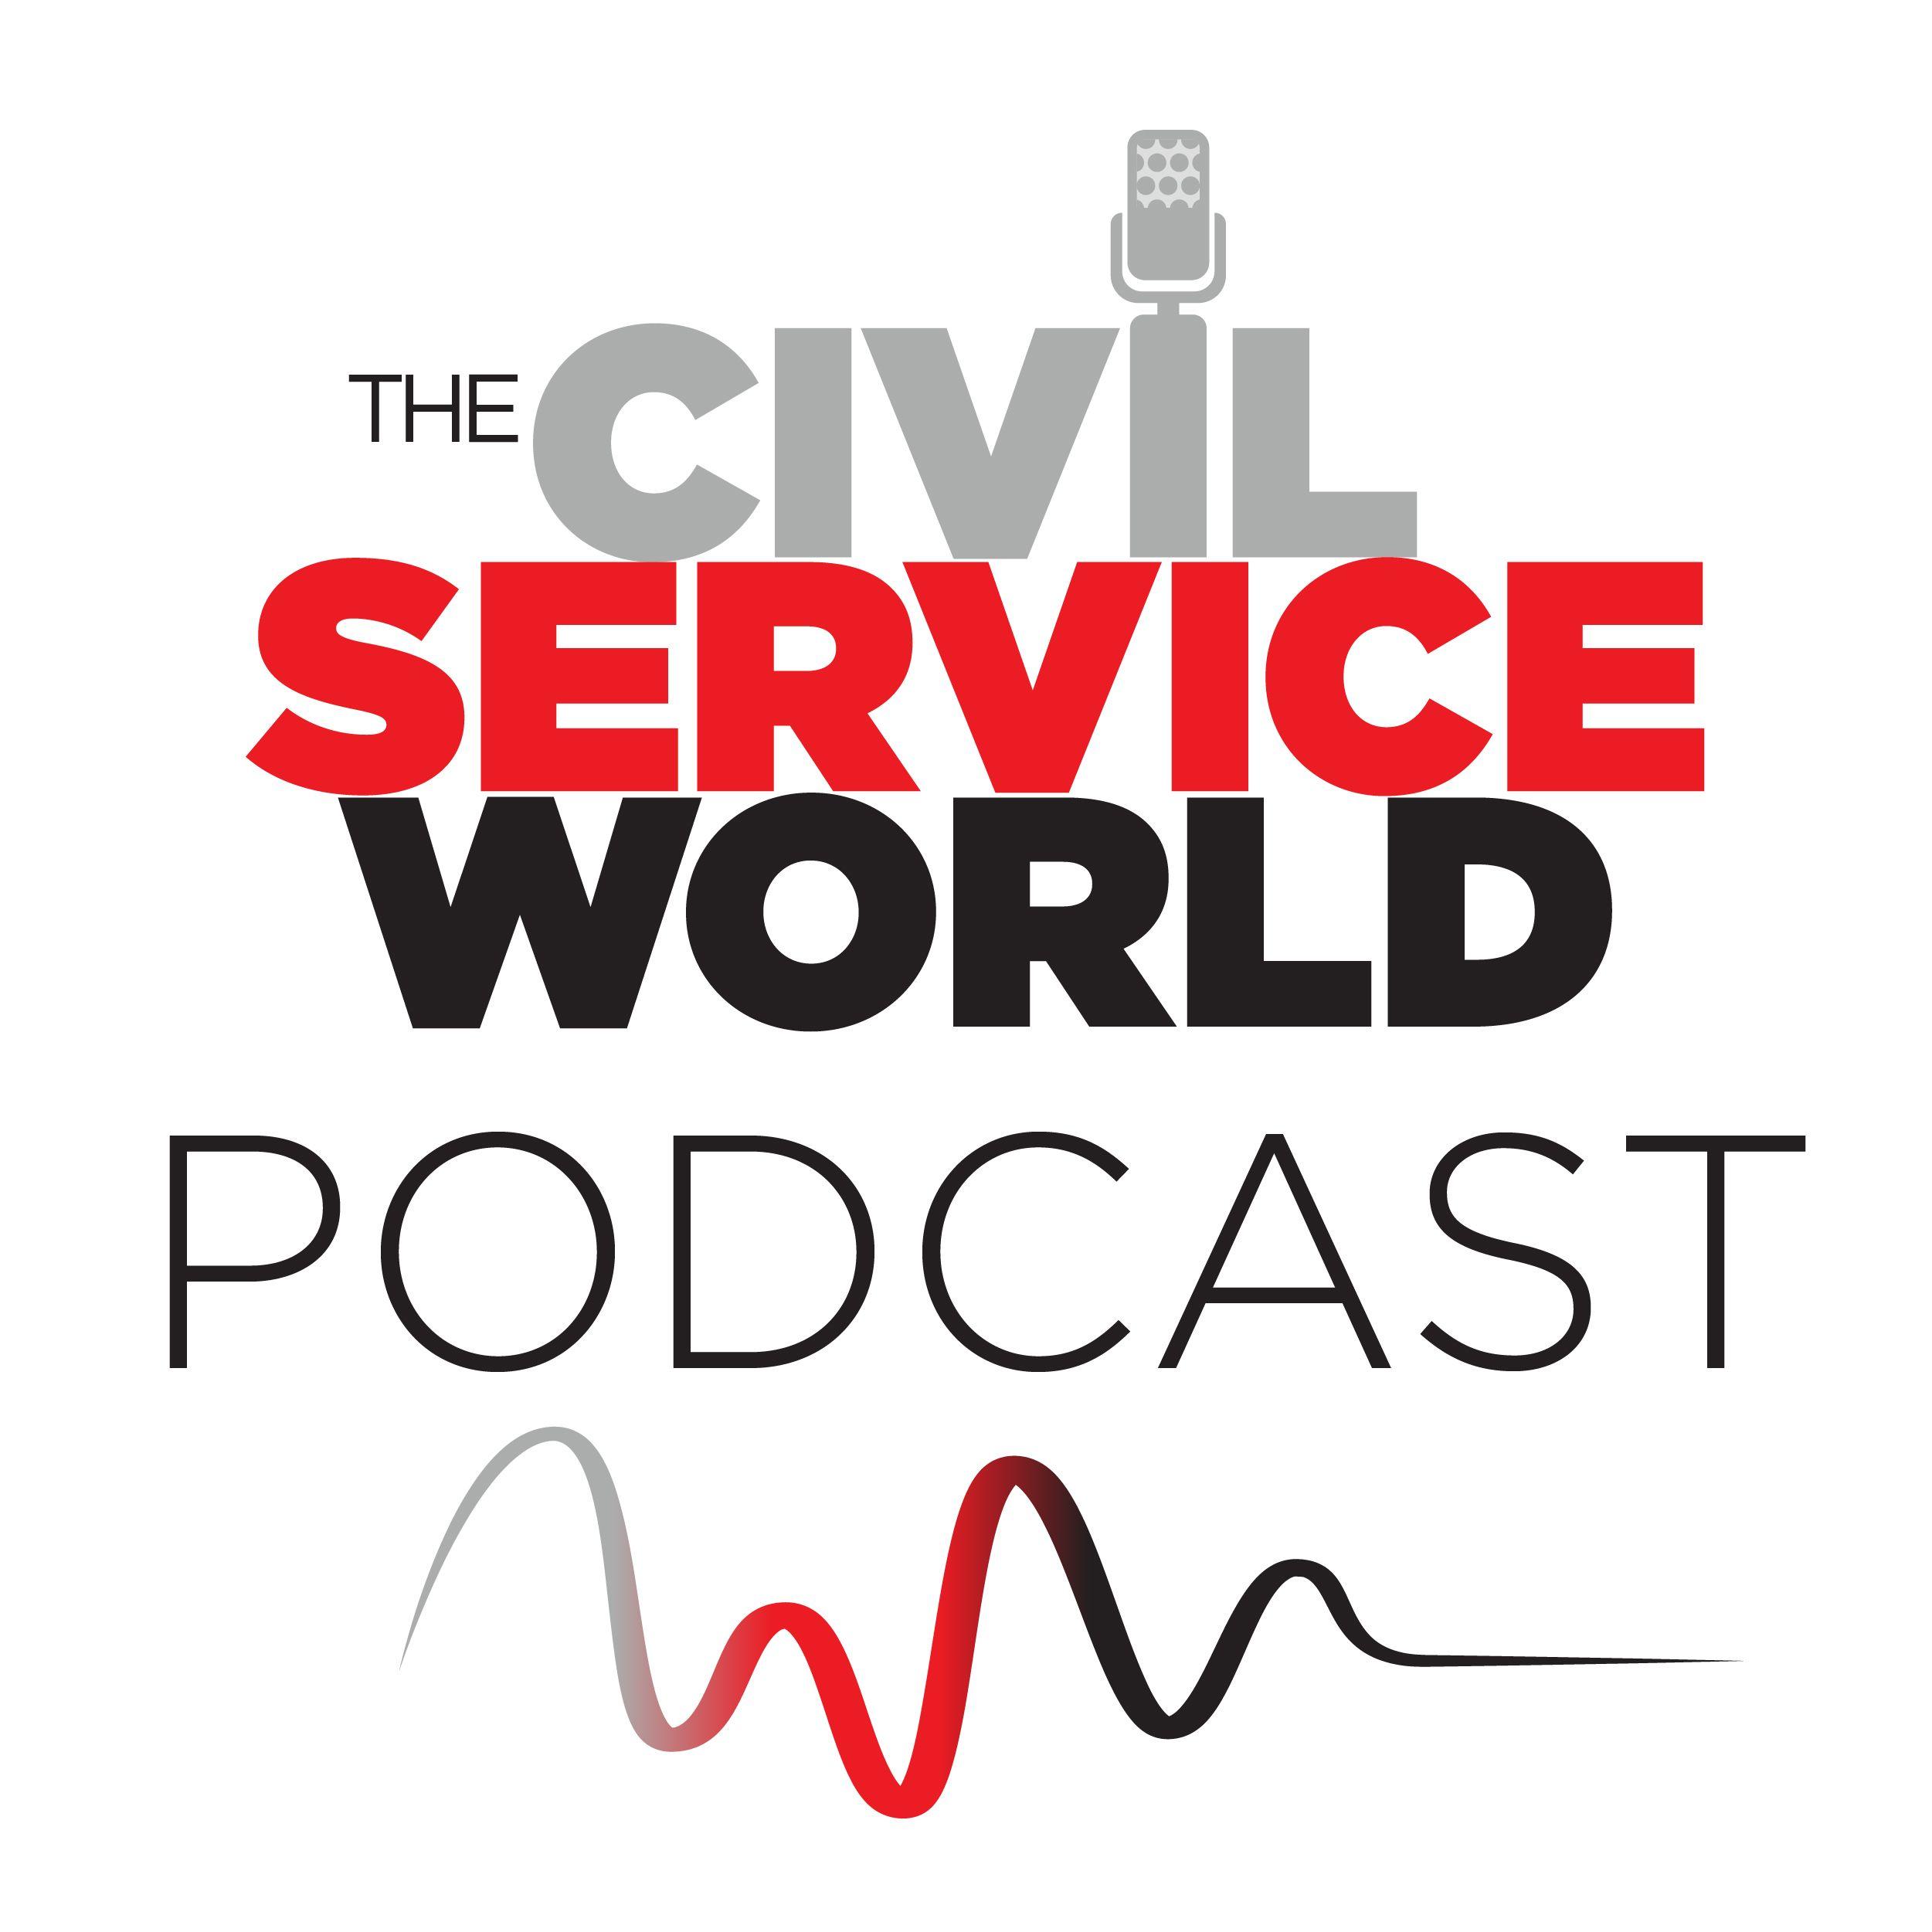 The Civil Service World Podcast